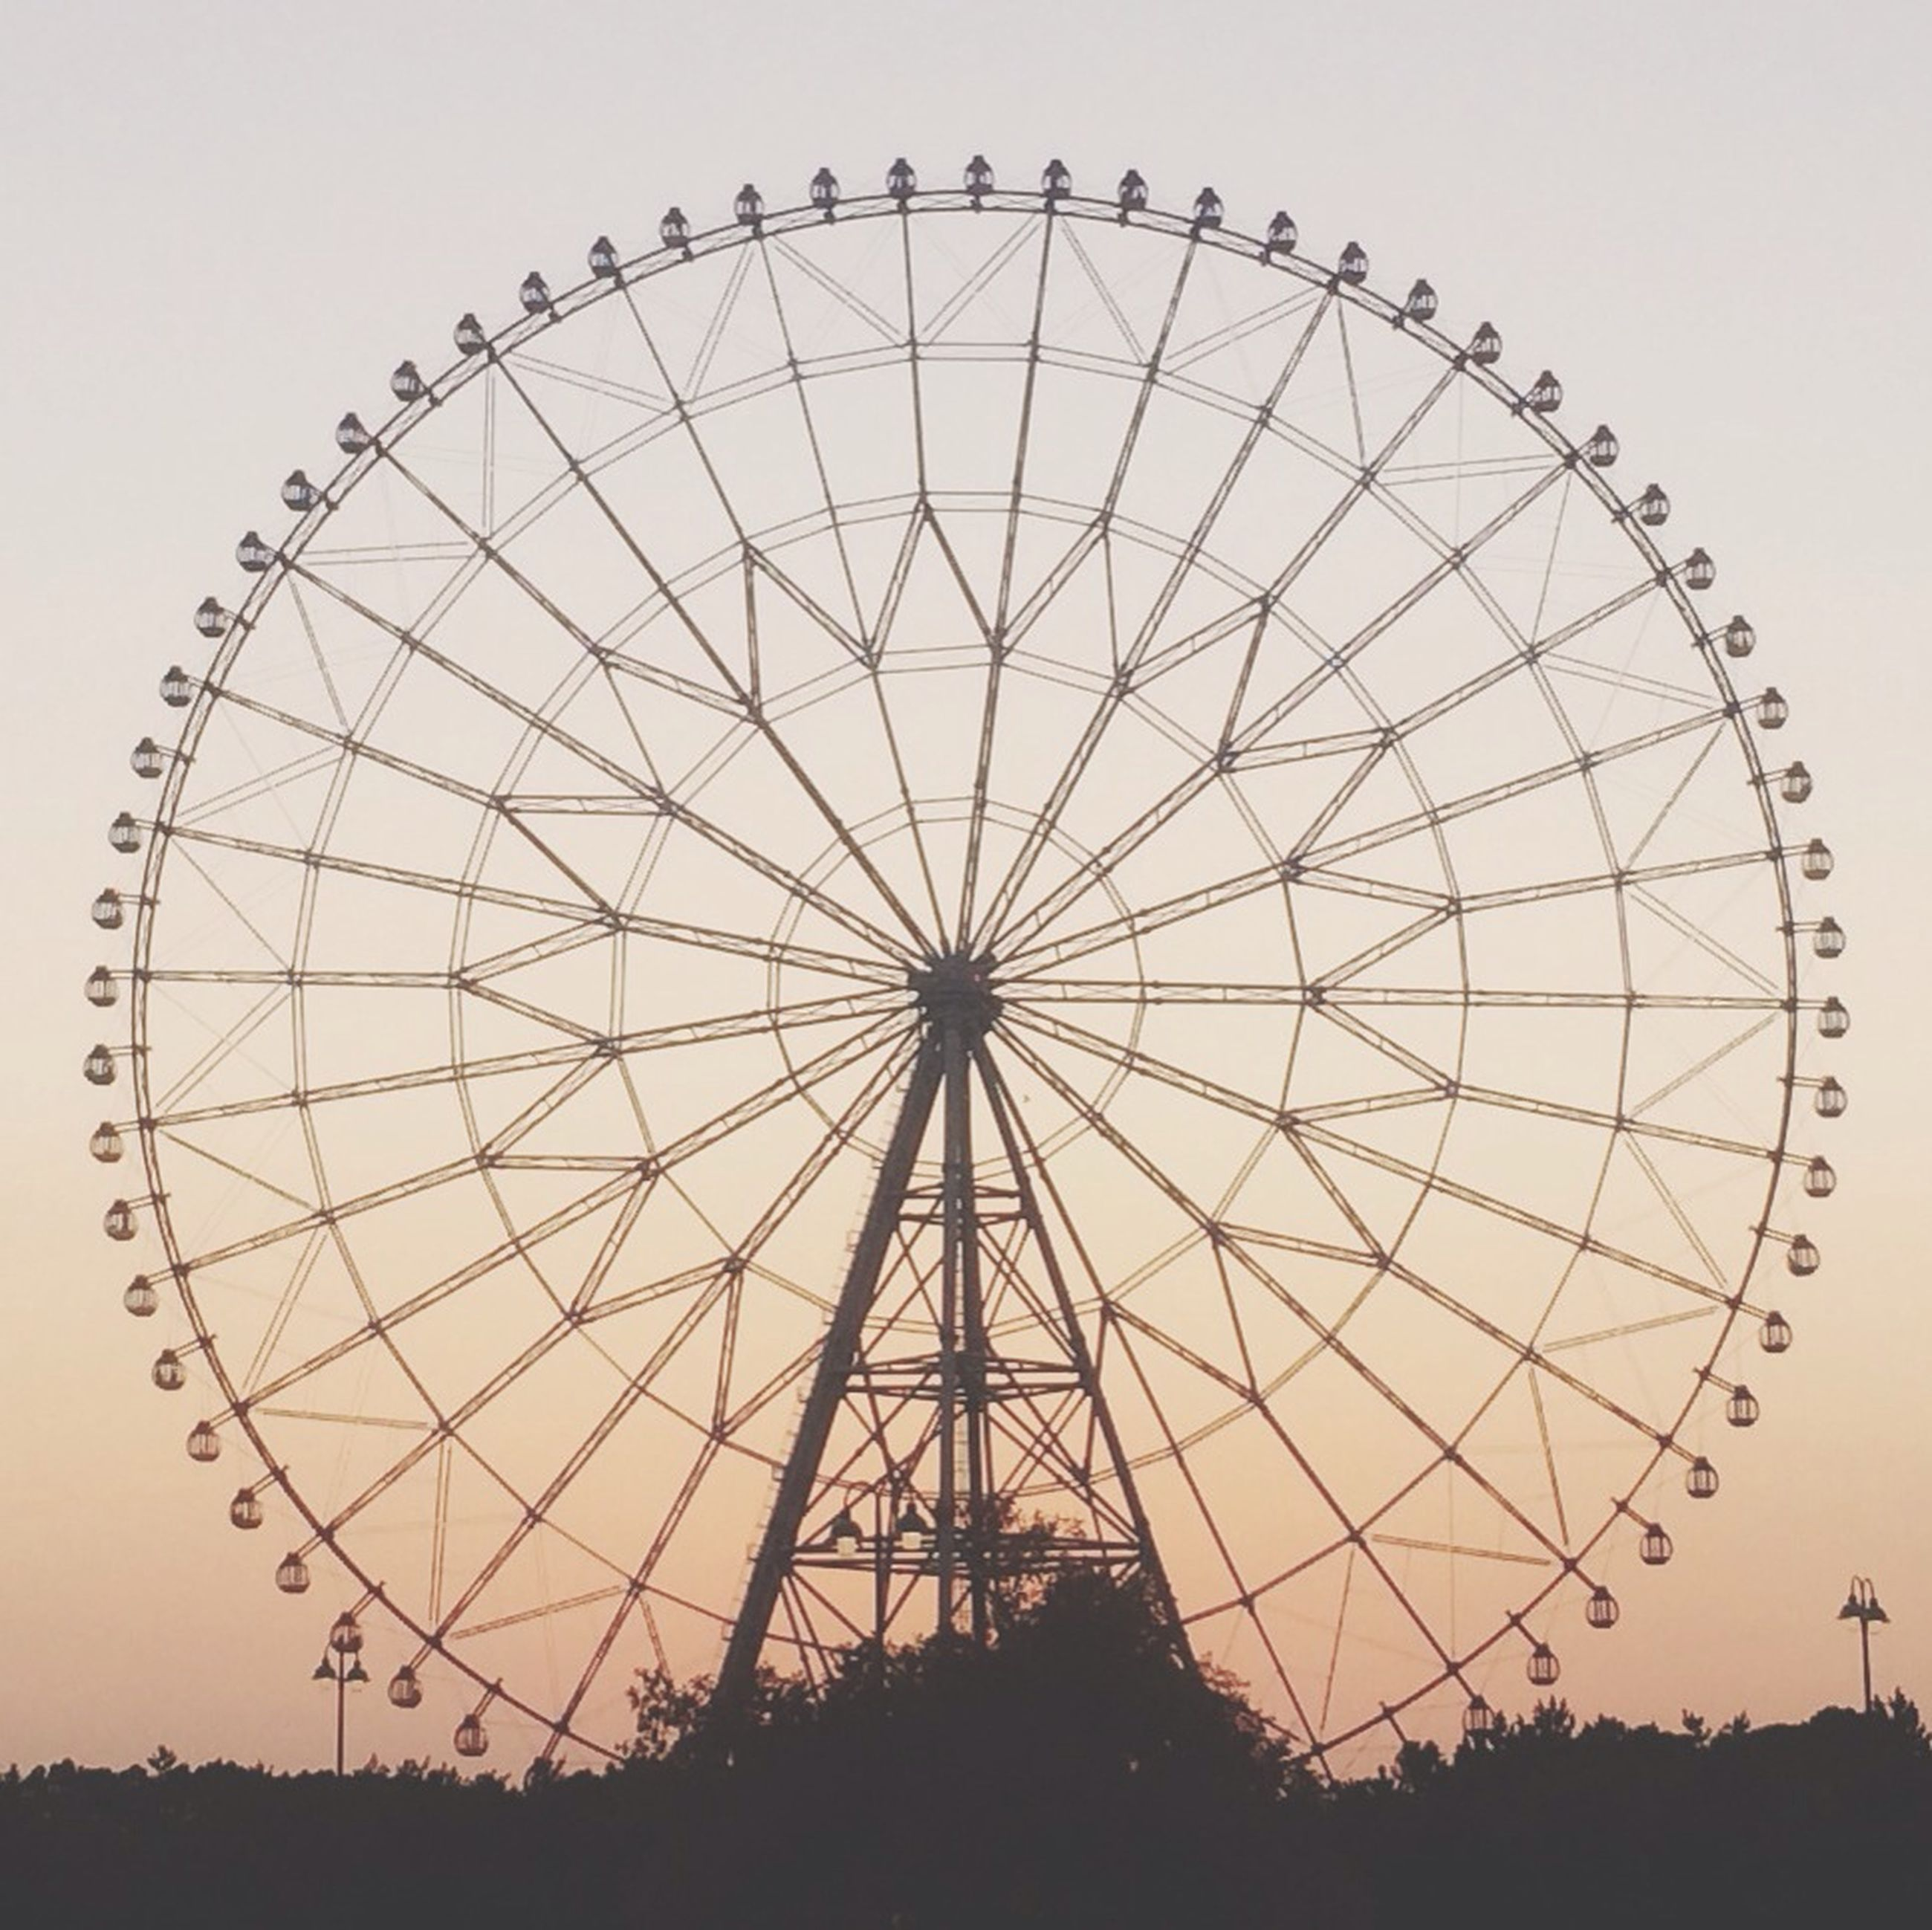 ferris wheel, amusement park, amusement park ride, arts culture and entertainment, low angle view, sky, circle, silhouette, clear sky, large, big wheel, fairground ride, fun, fairground, outdoors, built structure, enjoyment, day, no people, geometric shape